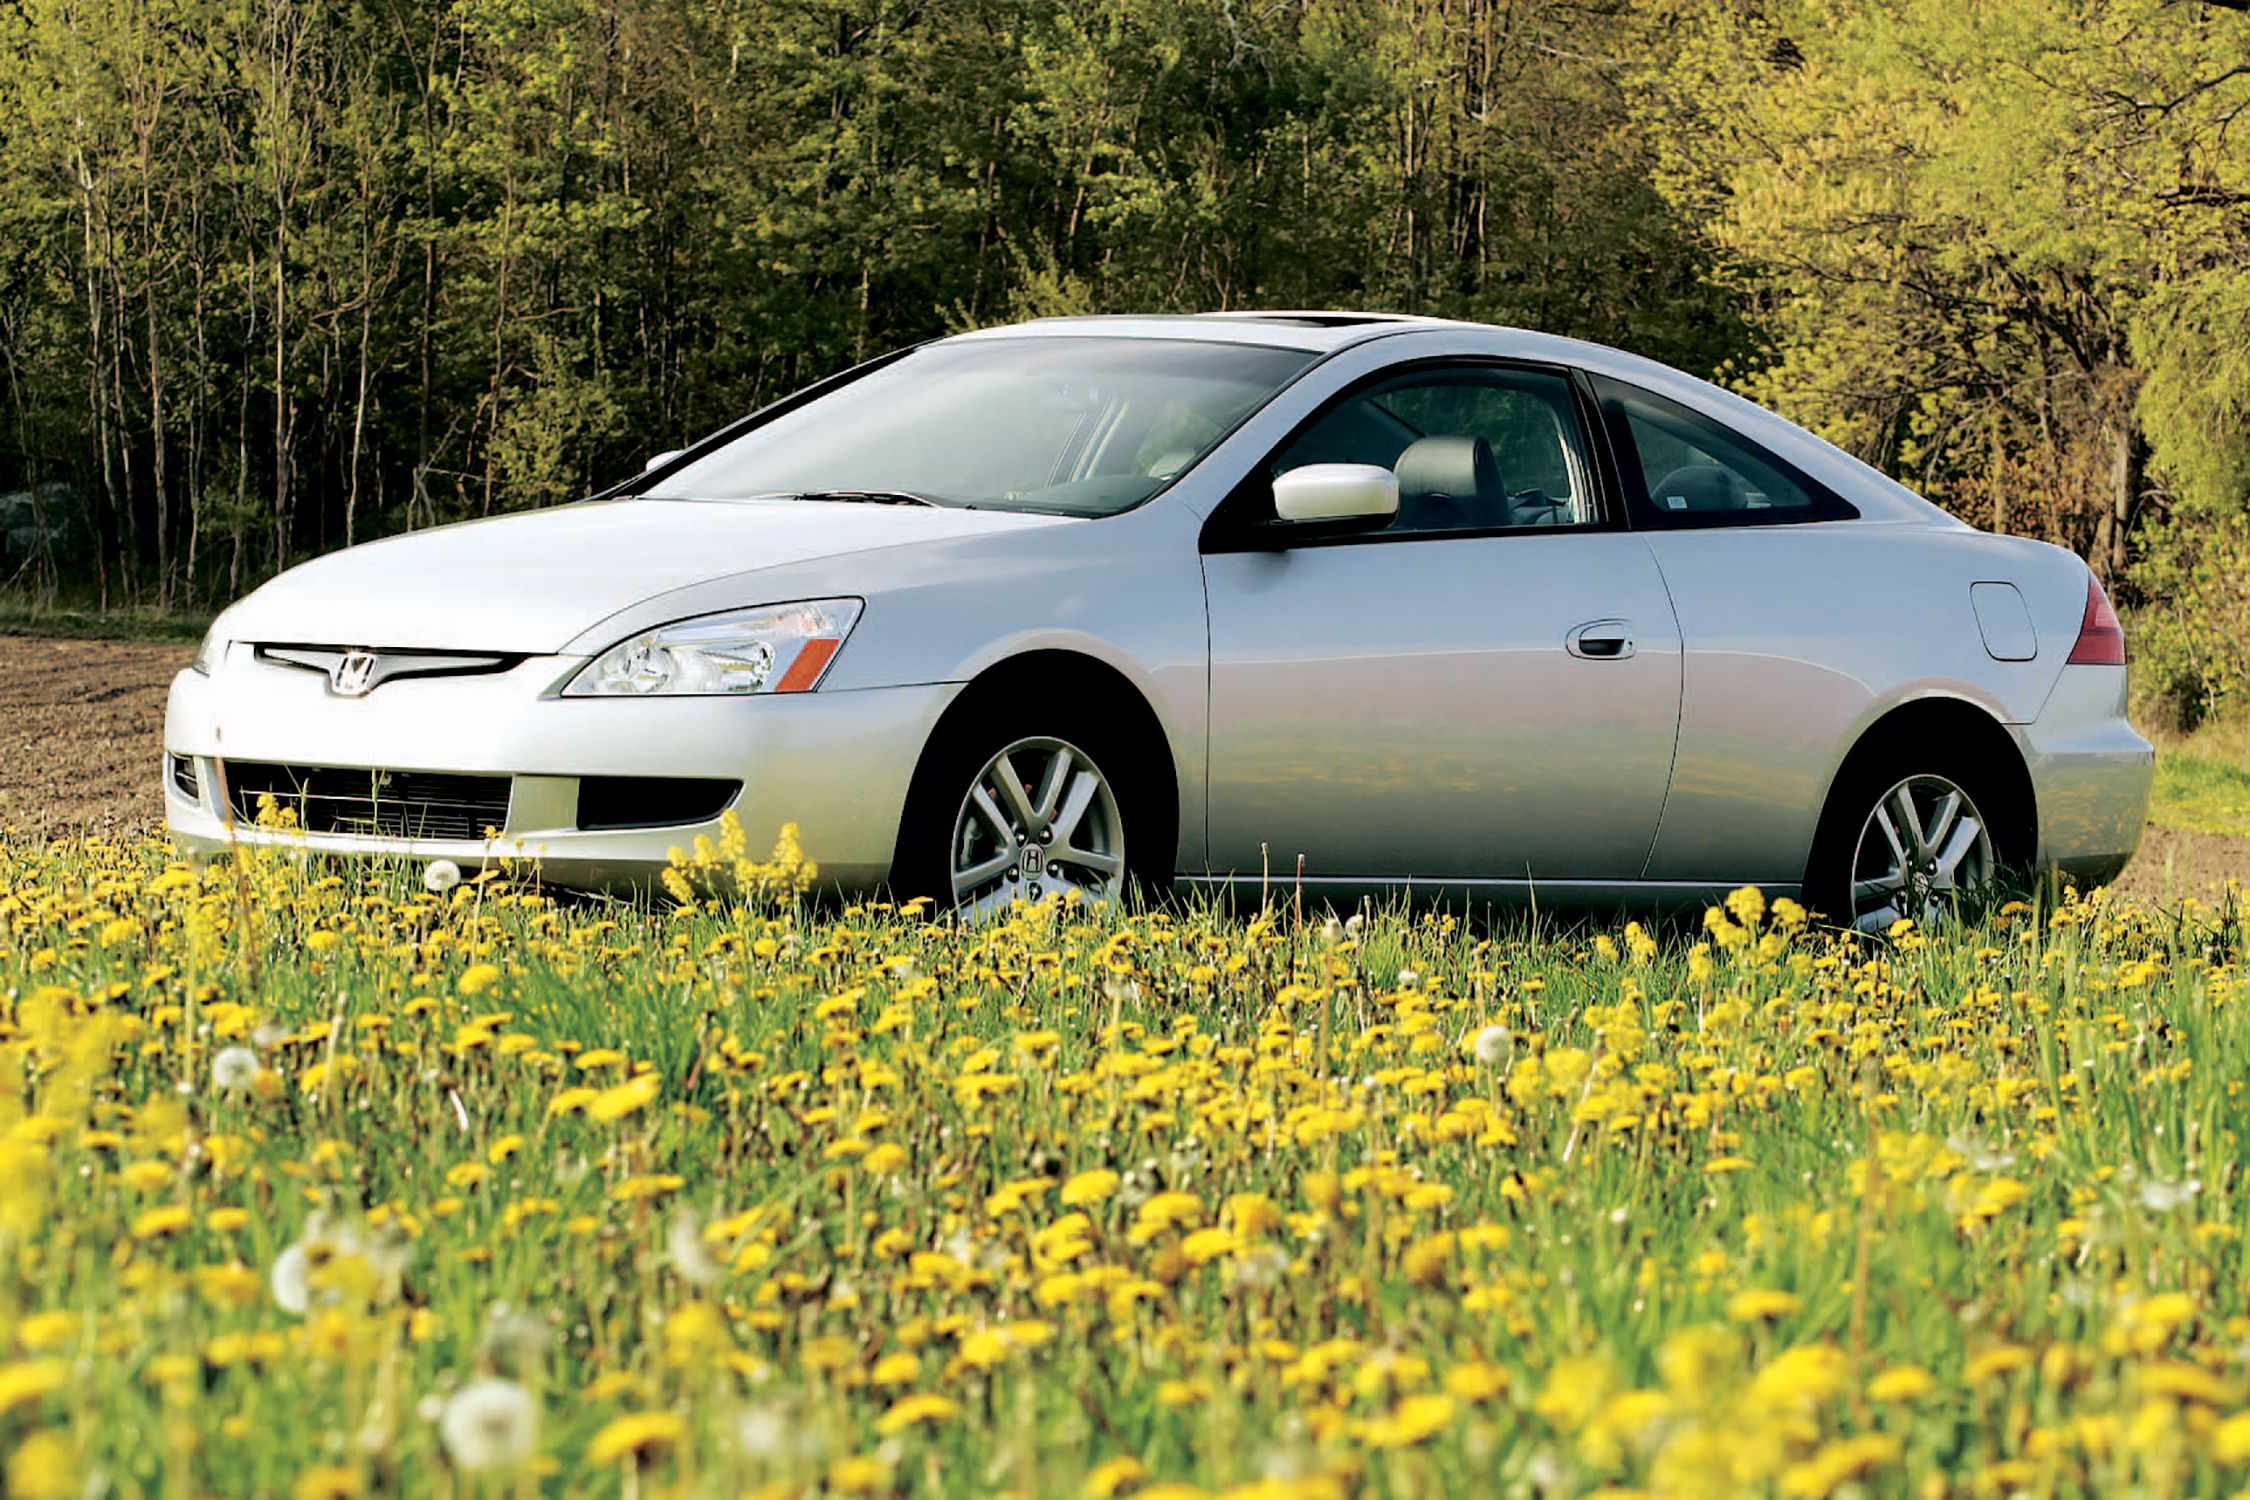 Kelebihan Honda Accord 2004 Murah Berkualitas